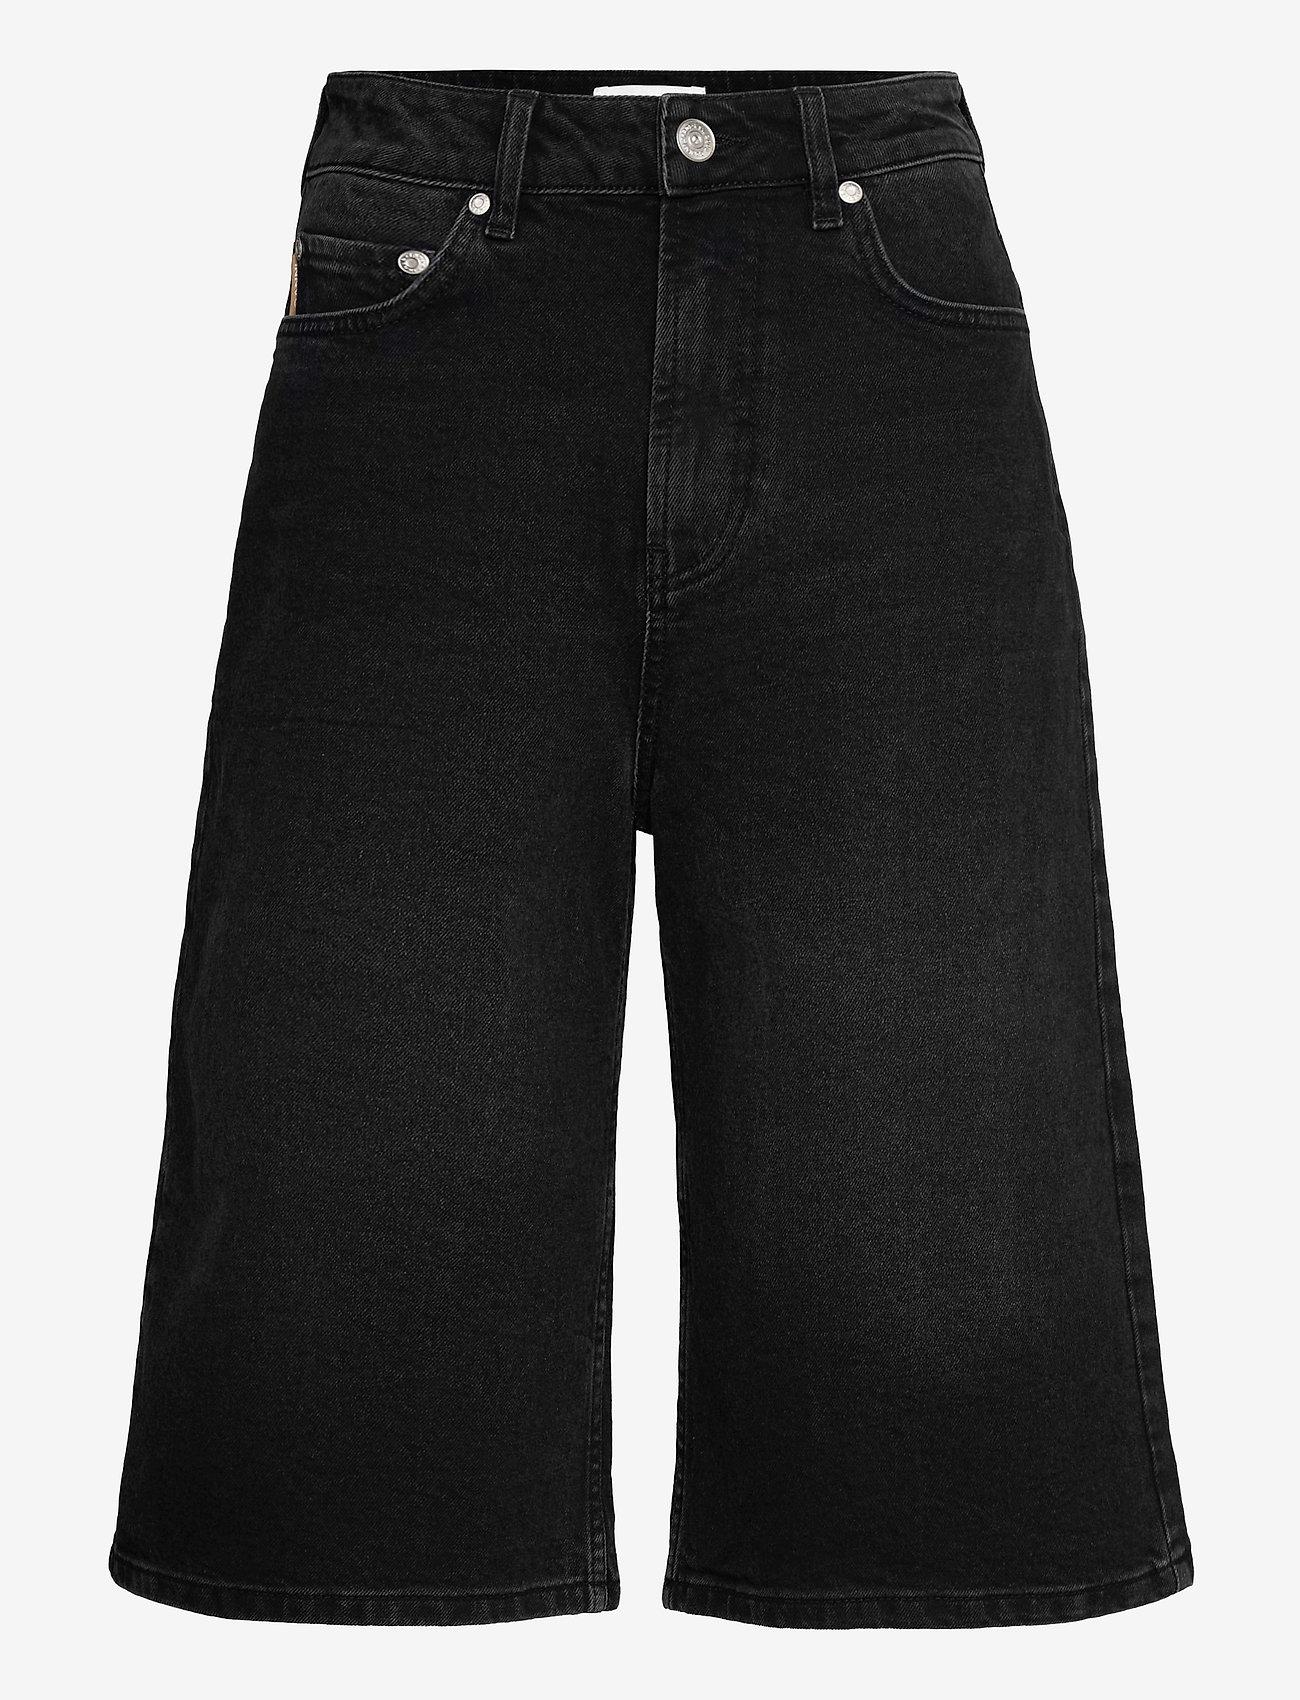 Ganni - Comfort Stretch - denimshorts - black - 0